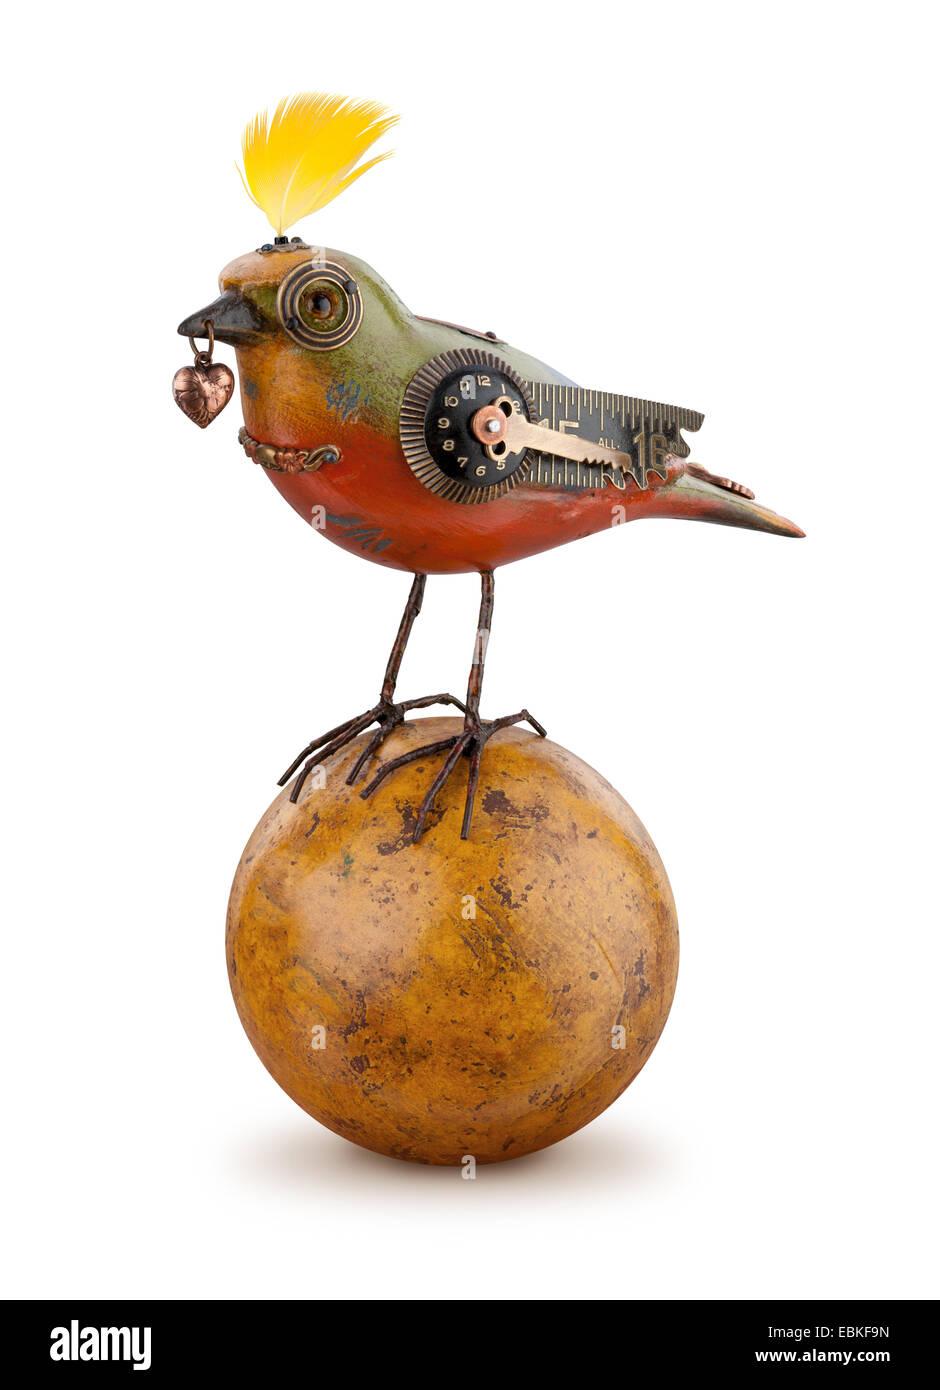 Steampunk Mechanical Bird isolated. - Stock Image